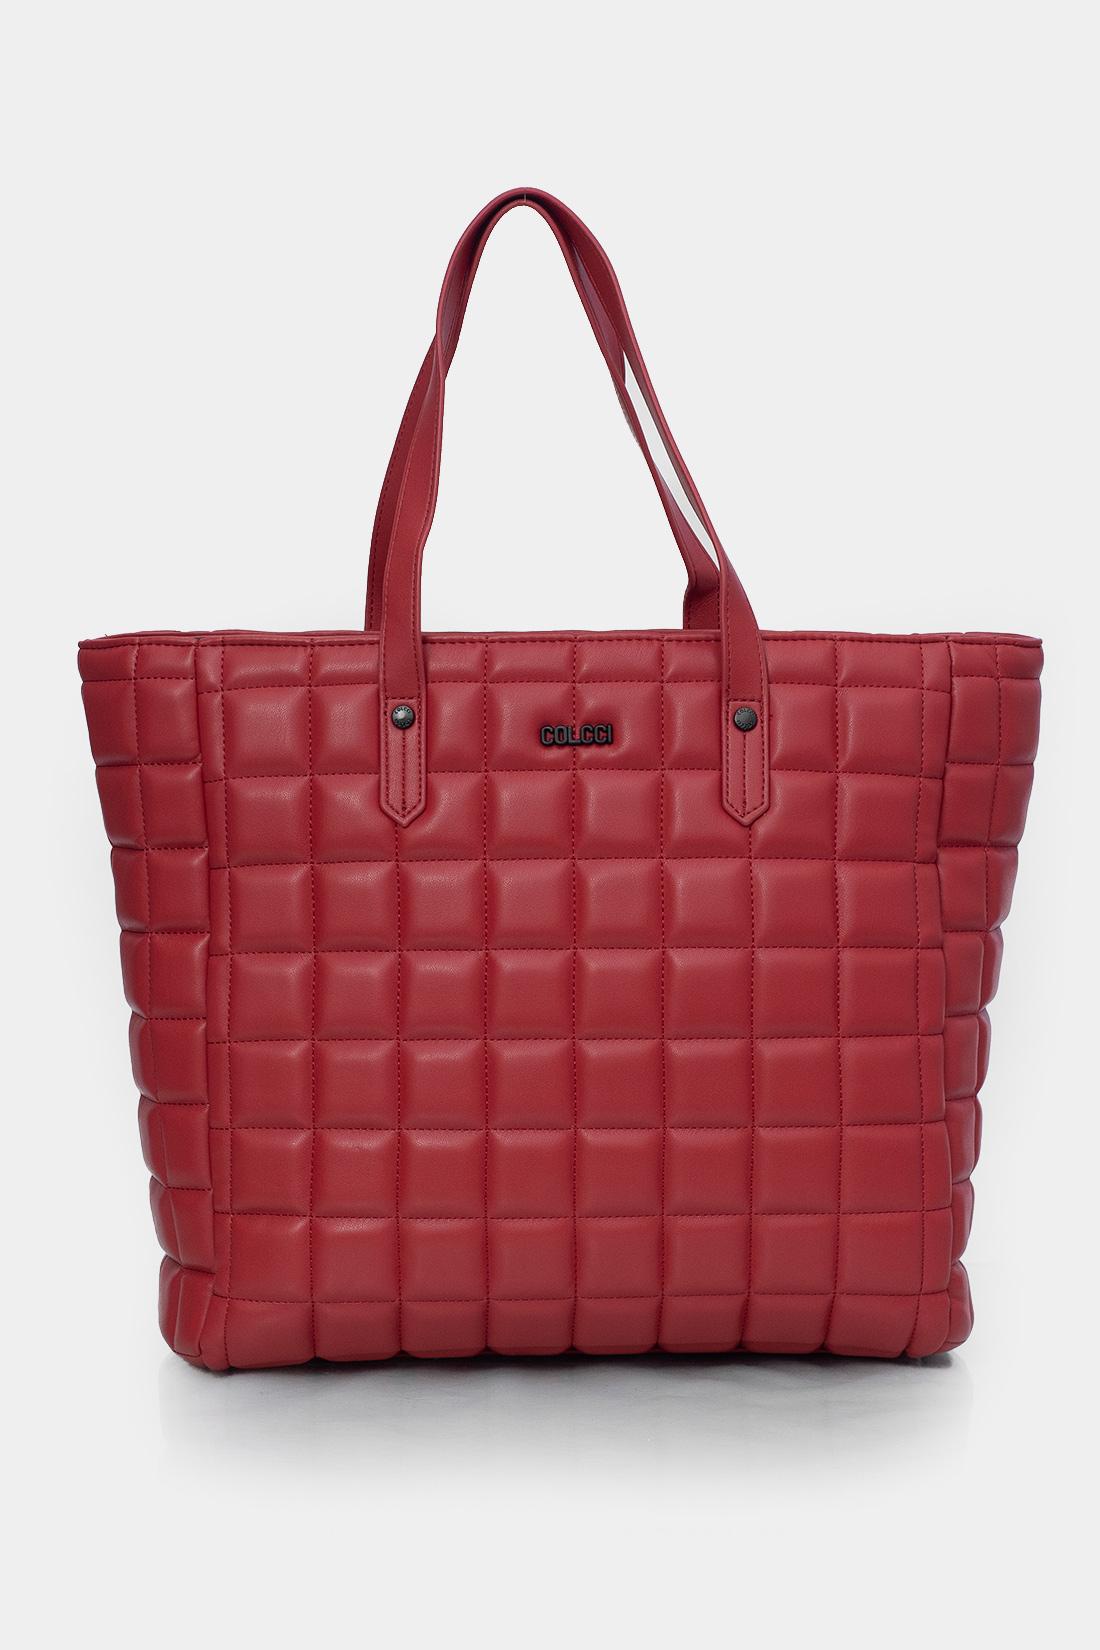 Bolsa Colcci Shop Bag Geometrico